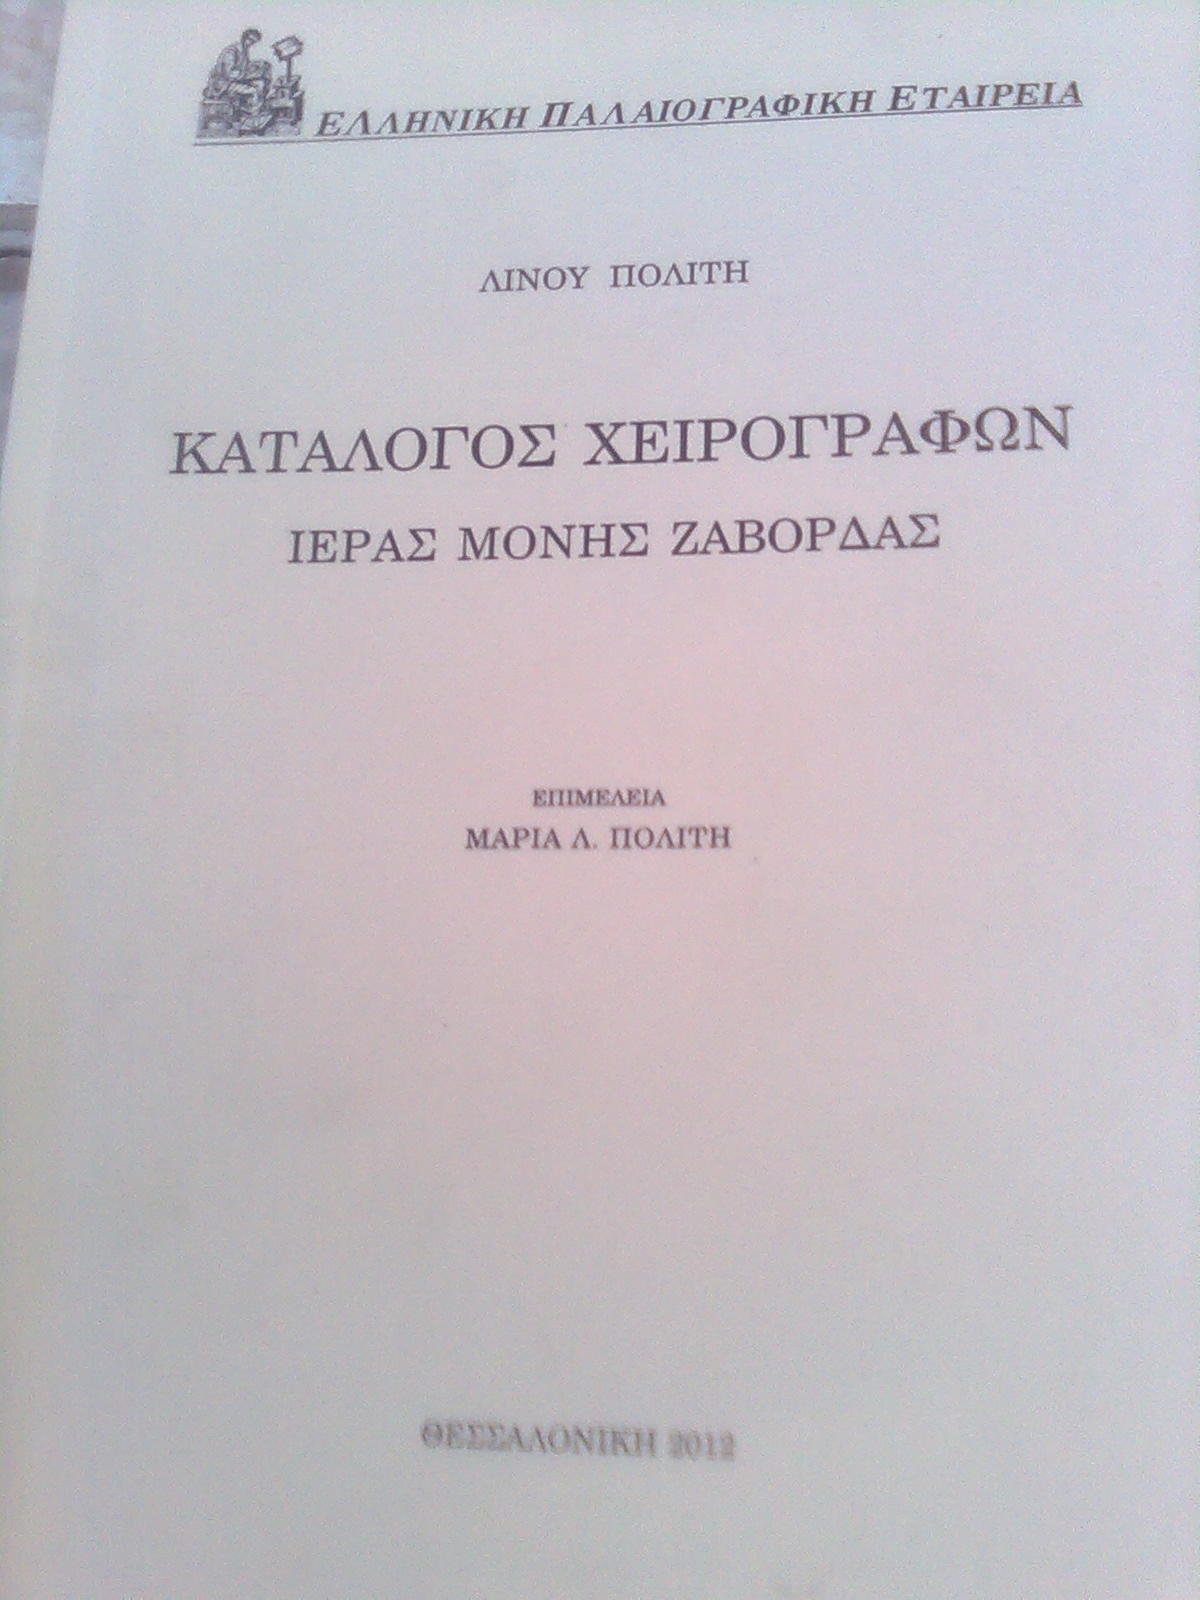 Kατάλογος χειρογράφων της ιεράς μονής Ζάβορδας